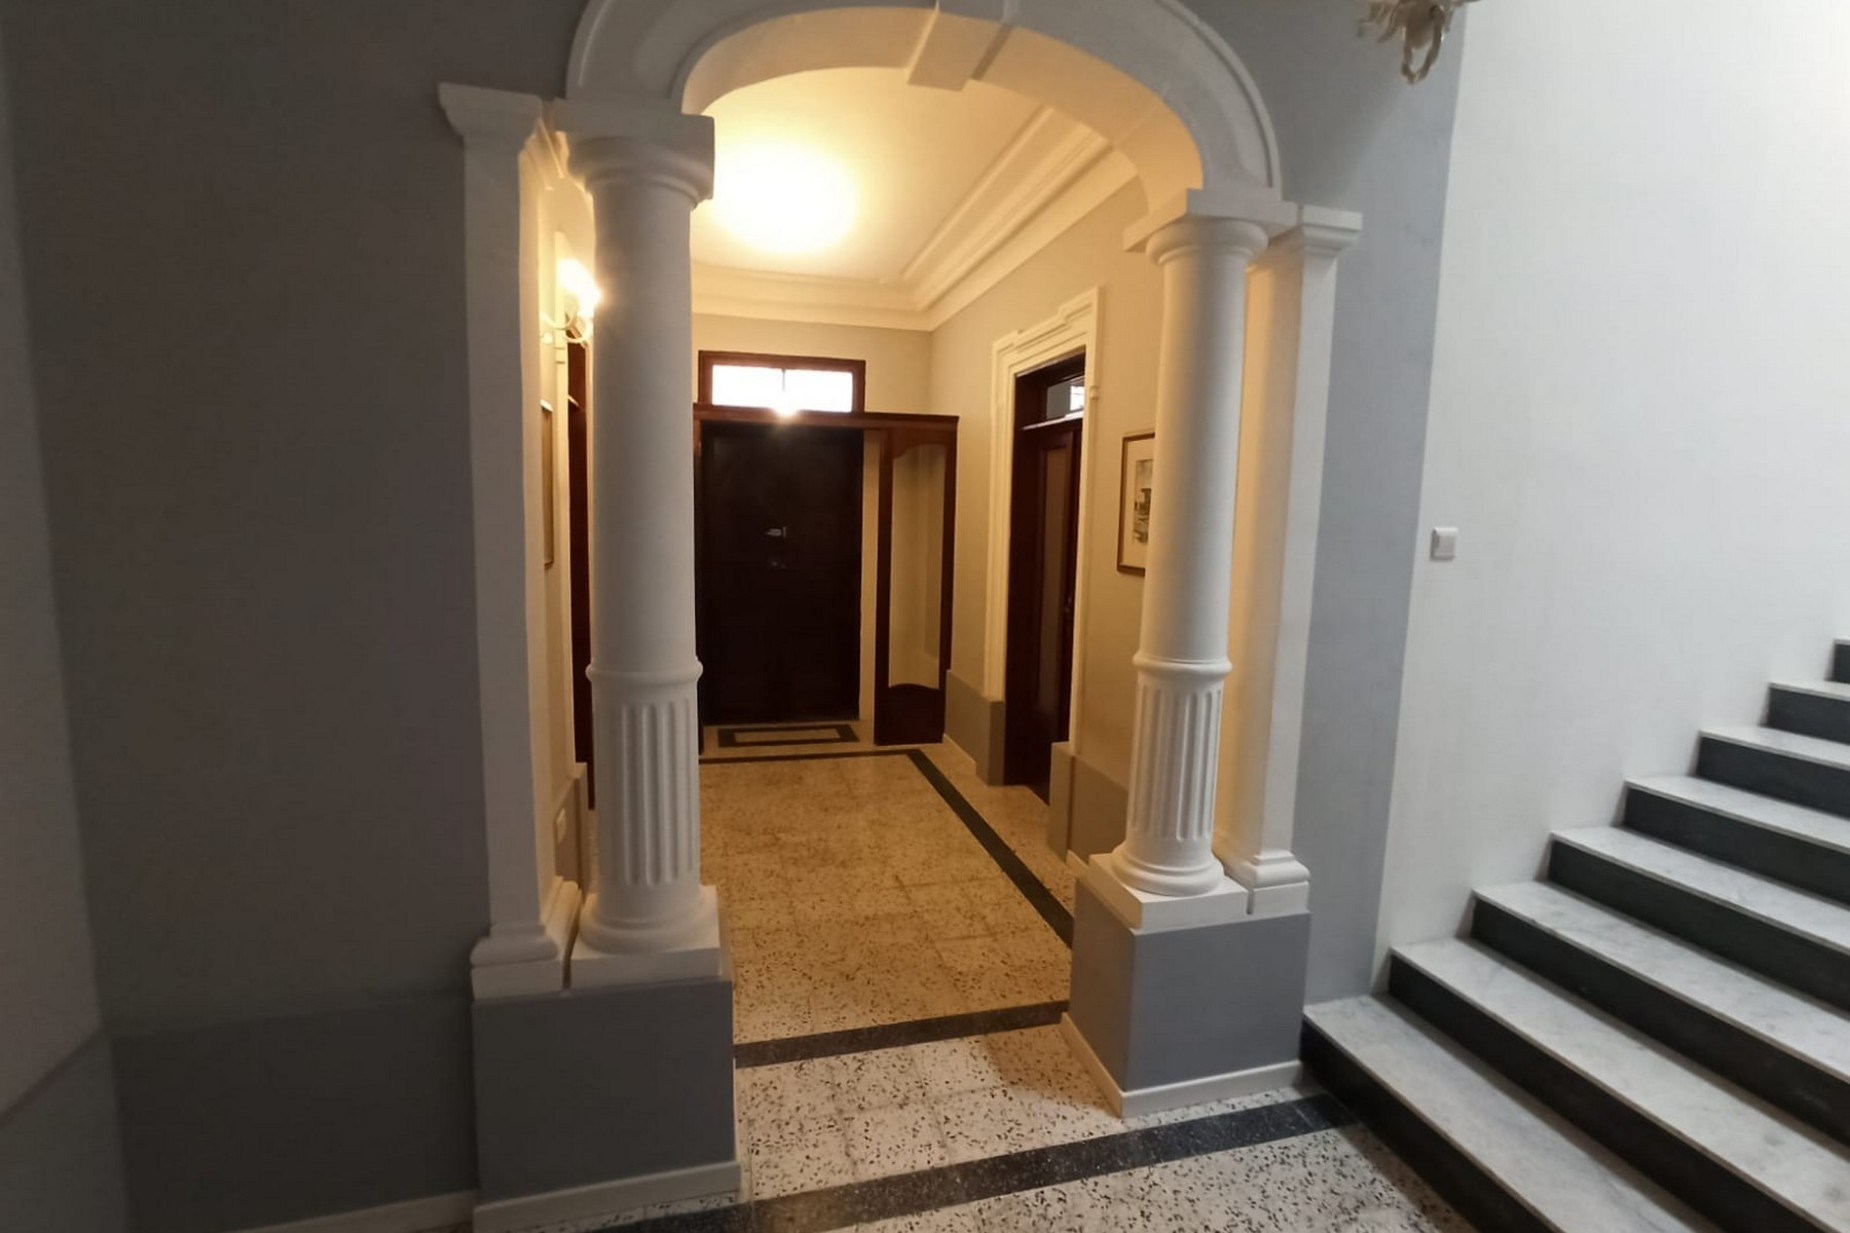 3 bed Town House For Rent in Birkirkara, Birkirkara - thumb 3